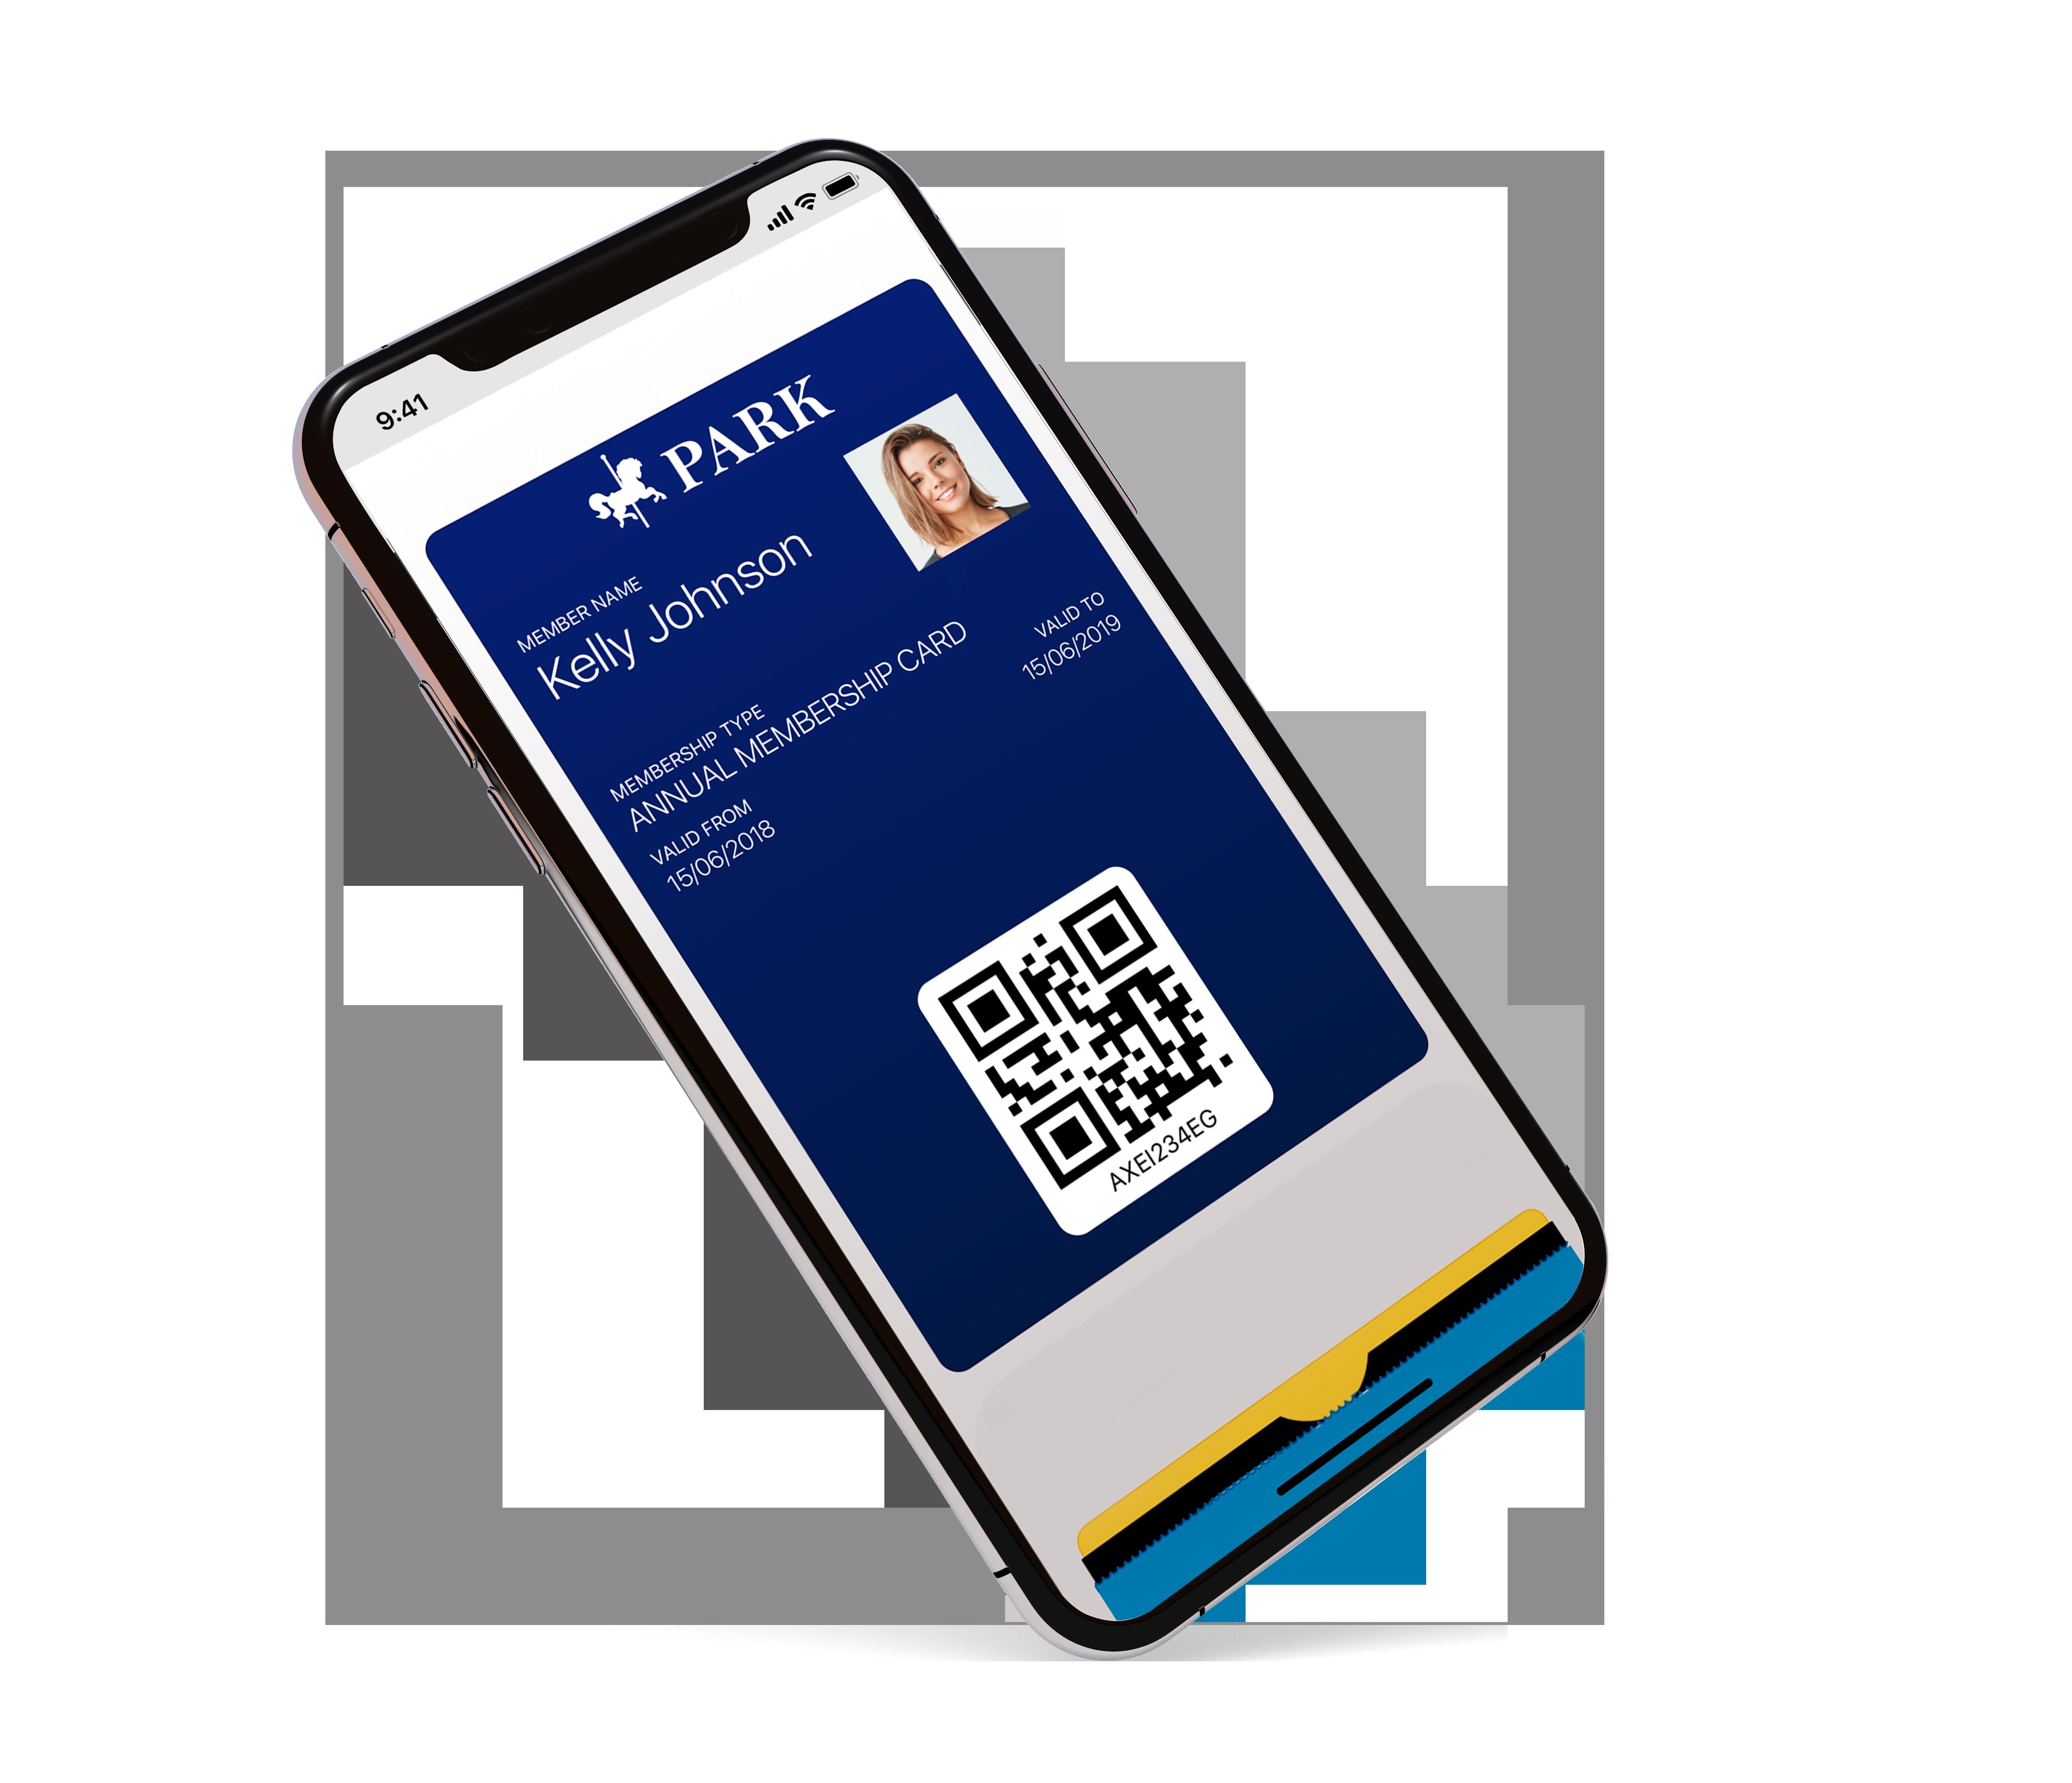 Membership card displayed in digital mobile wallet